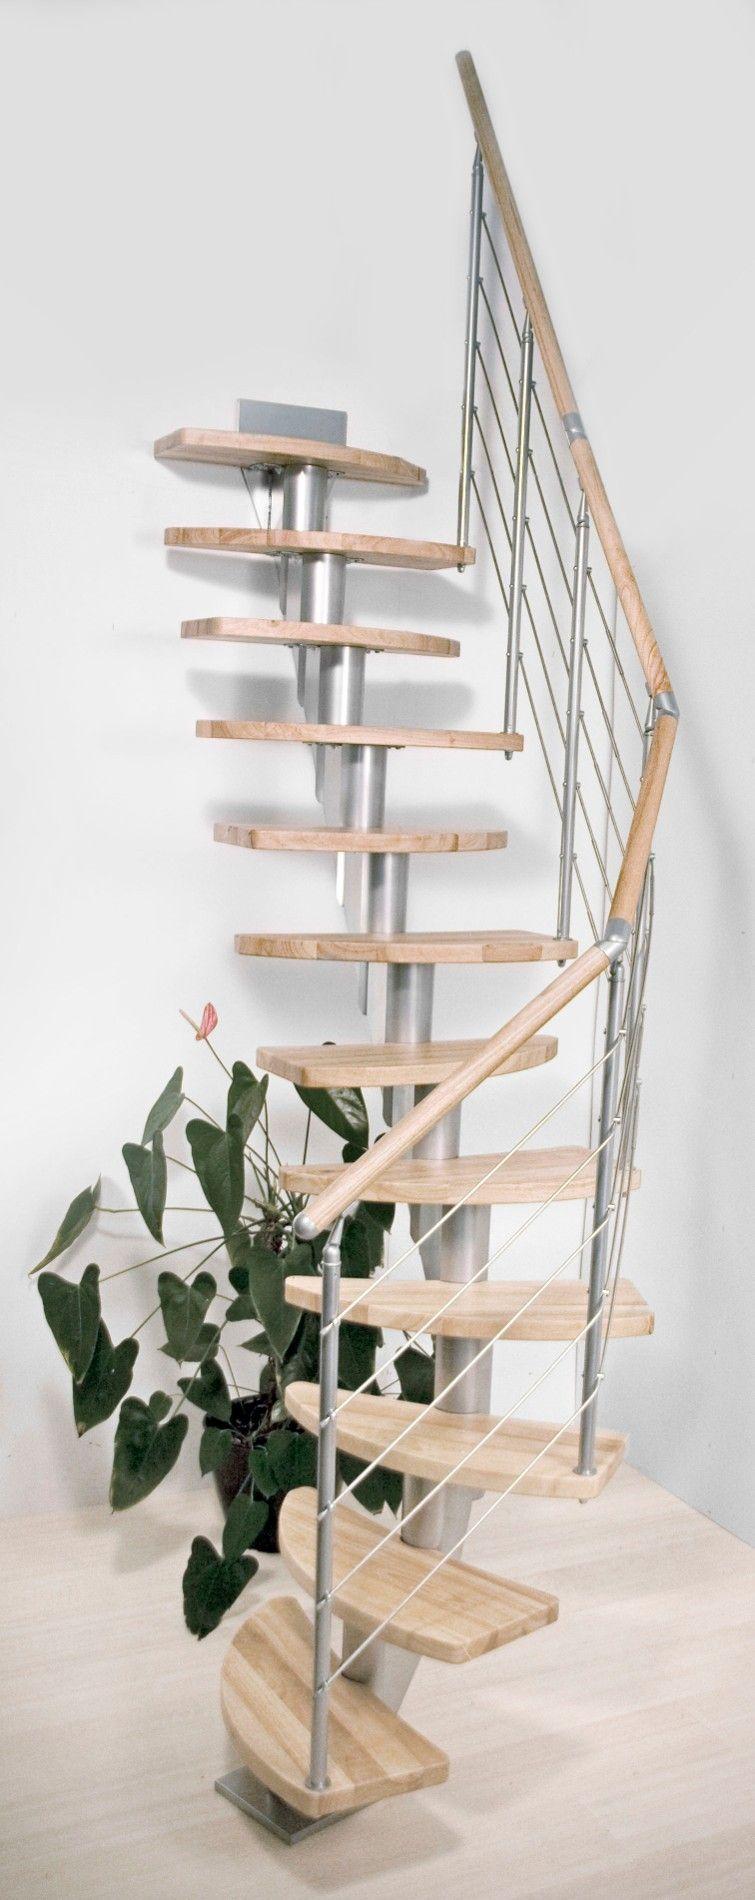 Dolle Copenhagen Space Saving Stair Kit (Loft Stair)